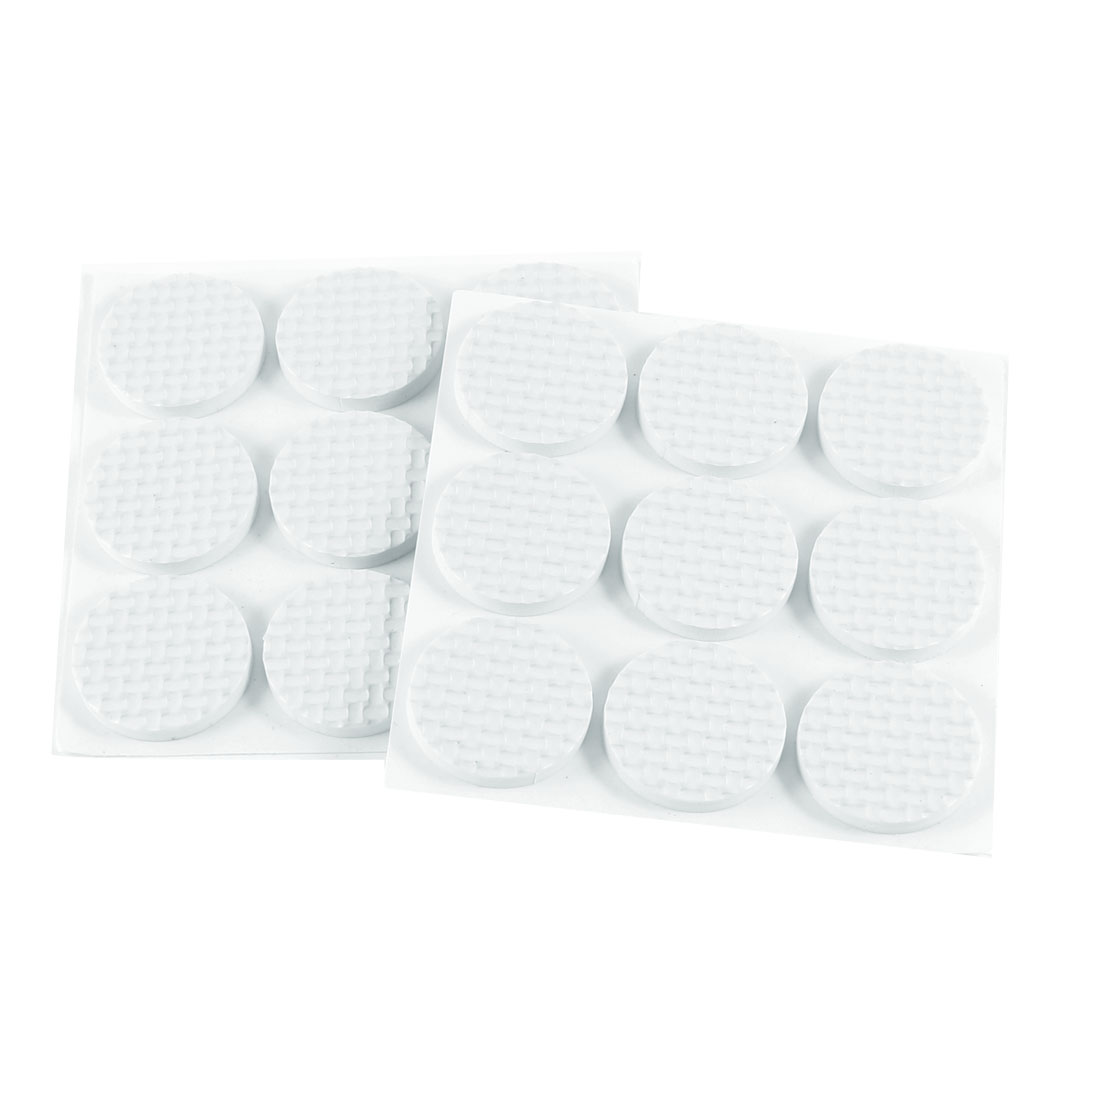 2 Packs Tables Chairs Leg Adhesive White Round Shape Foam Pad Cushion Mat